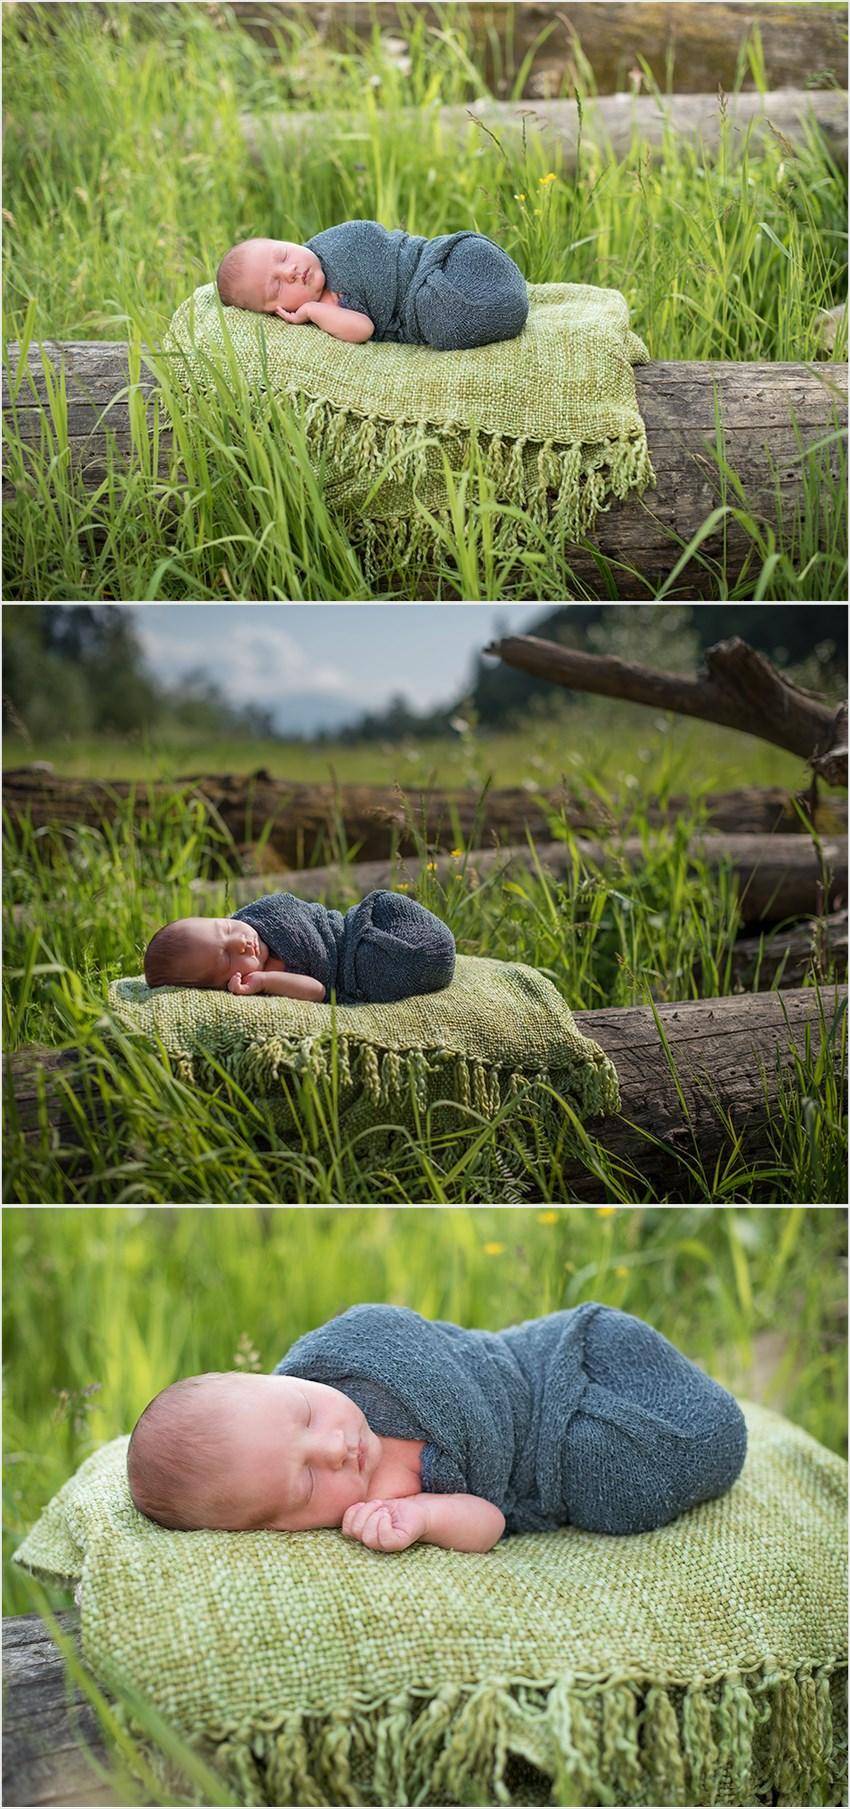 Baby Derrick Abbotsford Outdoor Newborn Photographer 005 (Side 5)